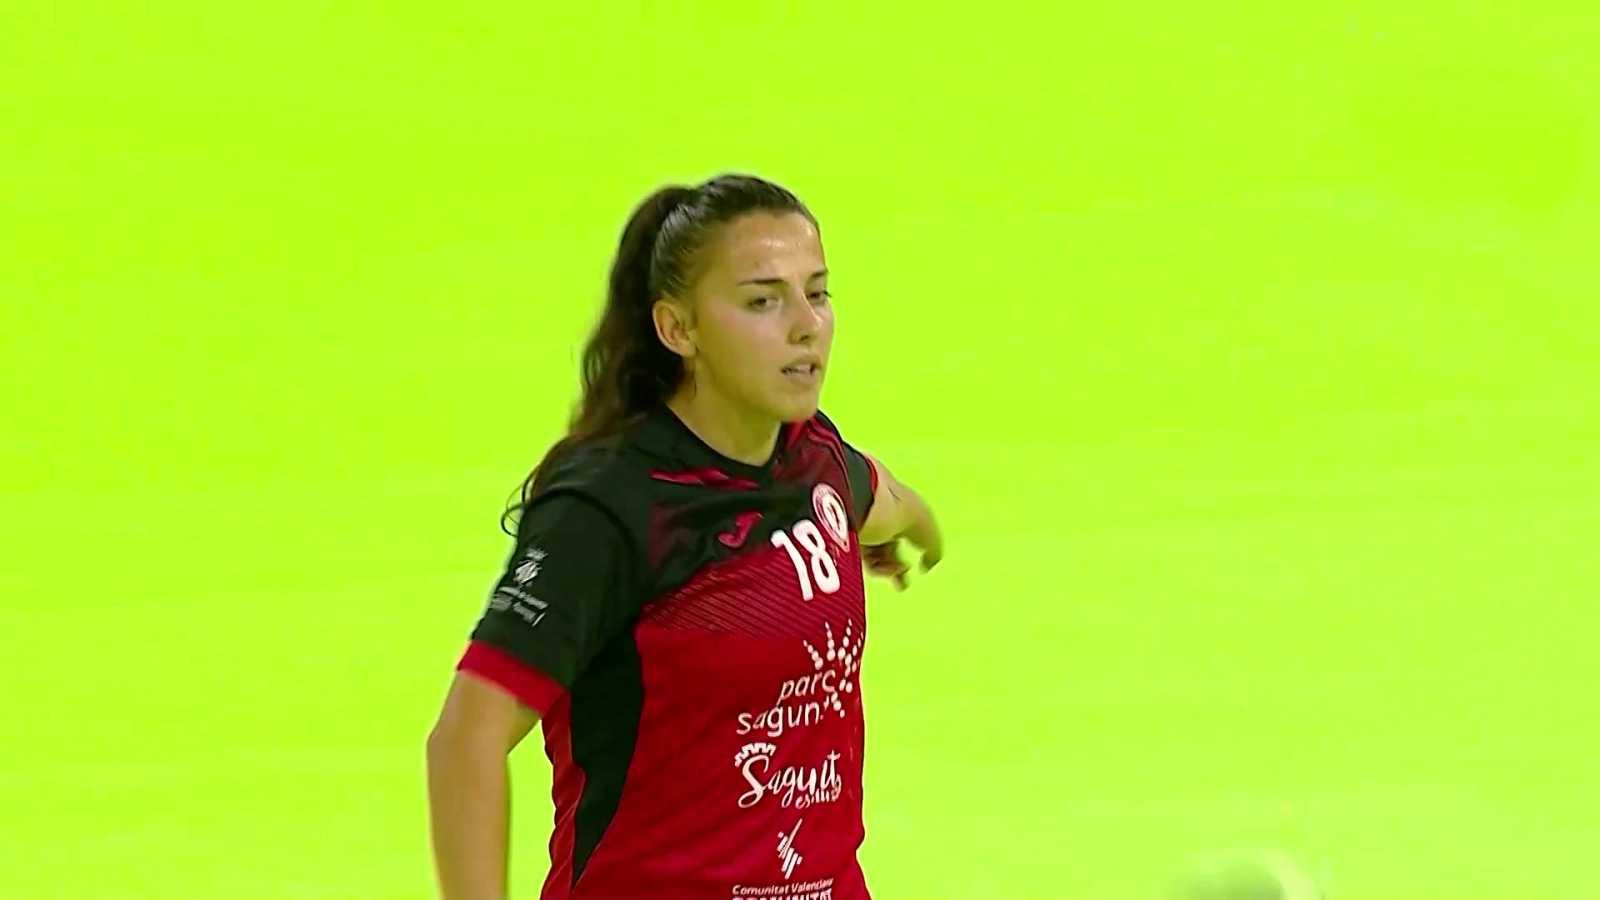 Balonmano - Liga Guerreras Iberdrola. 11ª jornada: Club Balonmano Morvedre - Liberbank Gijón - ver ahora